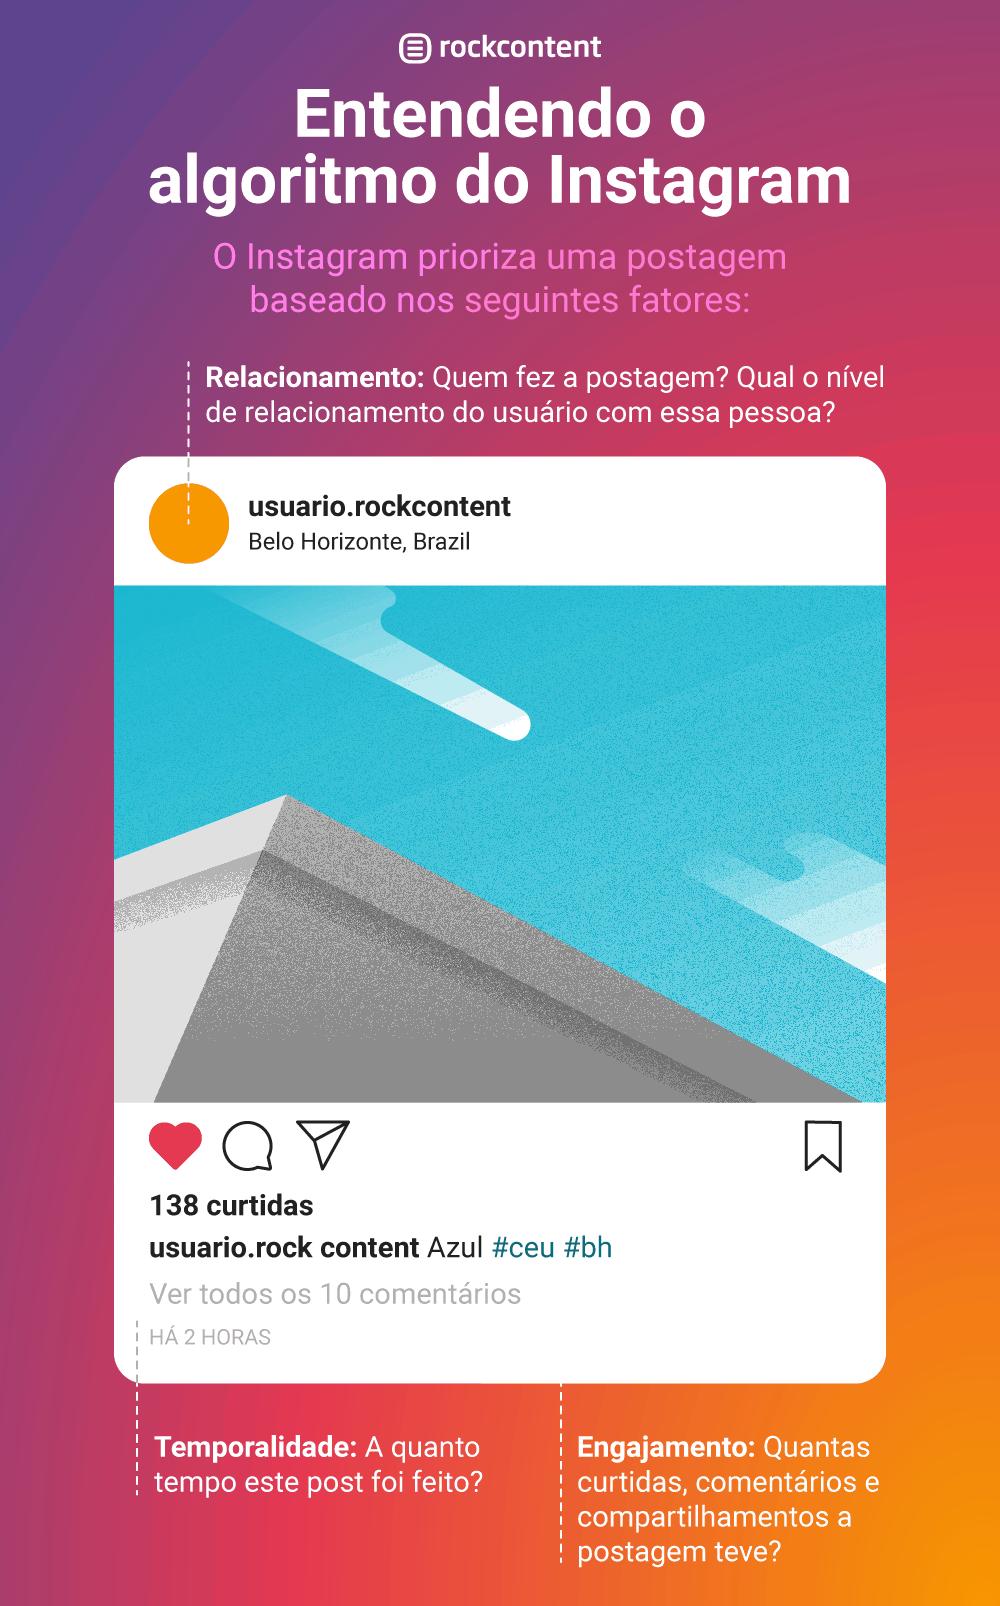 Algoritmo do Instagram